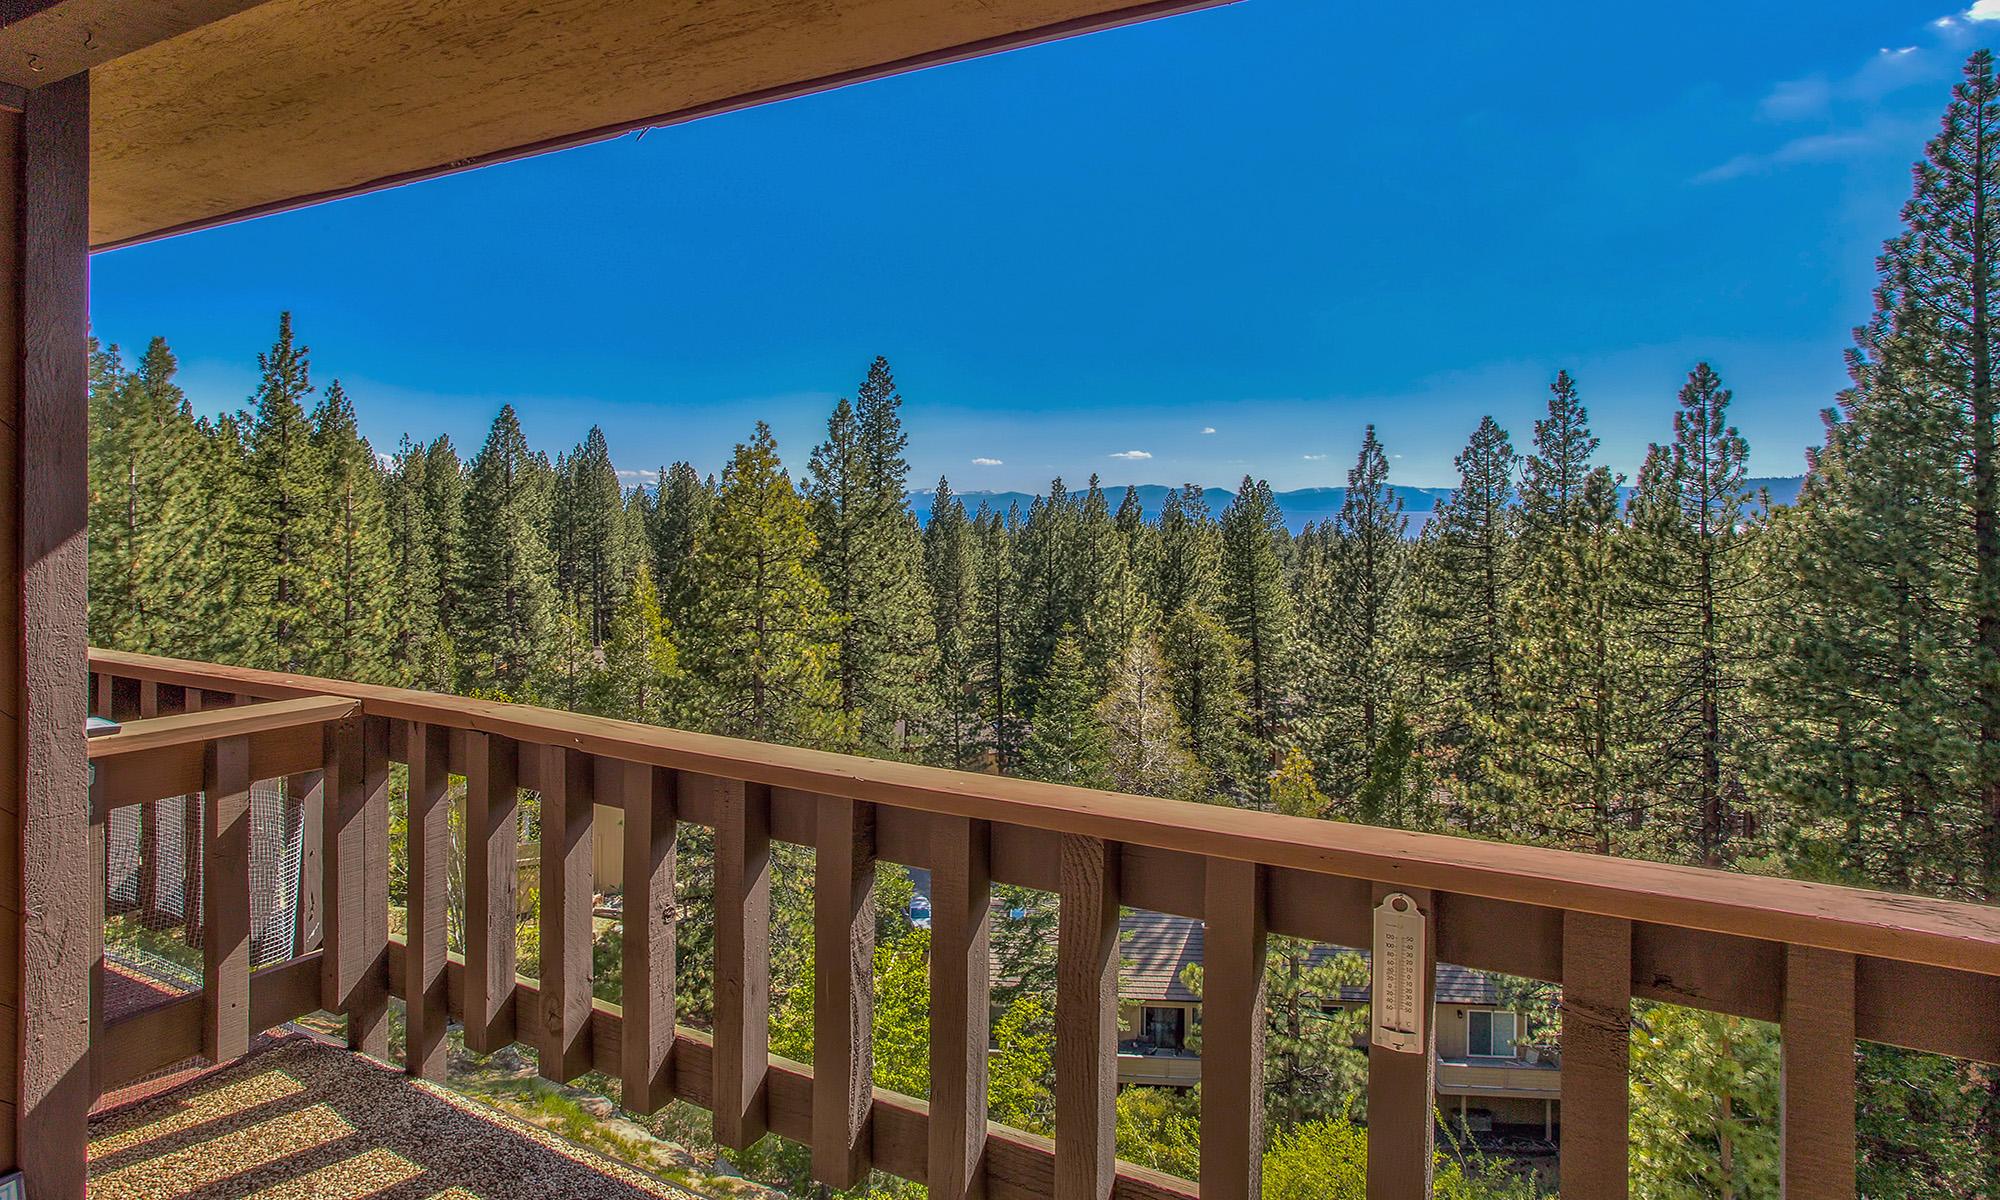 Condominium for Sale at 335 Ski Way #352 Incline Village, Nevada 89451 United States